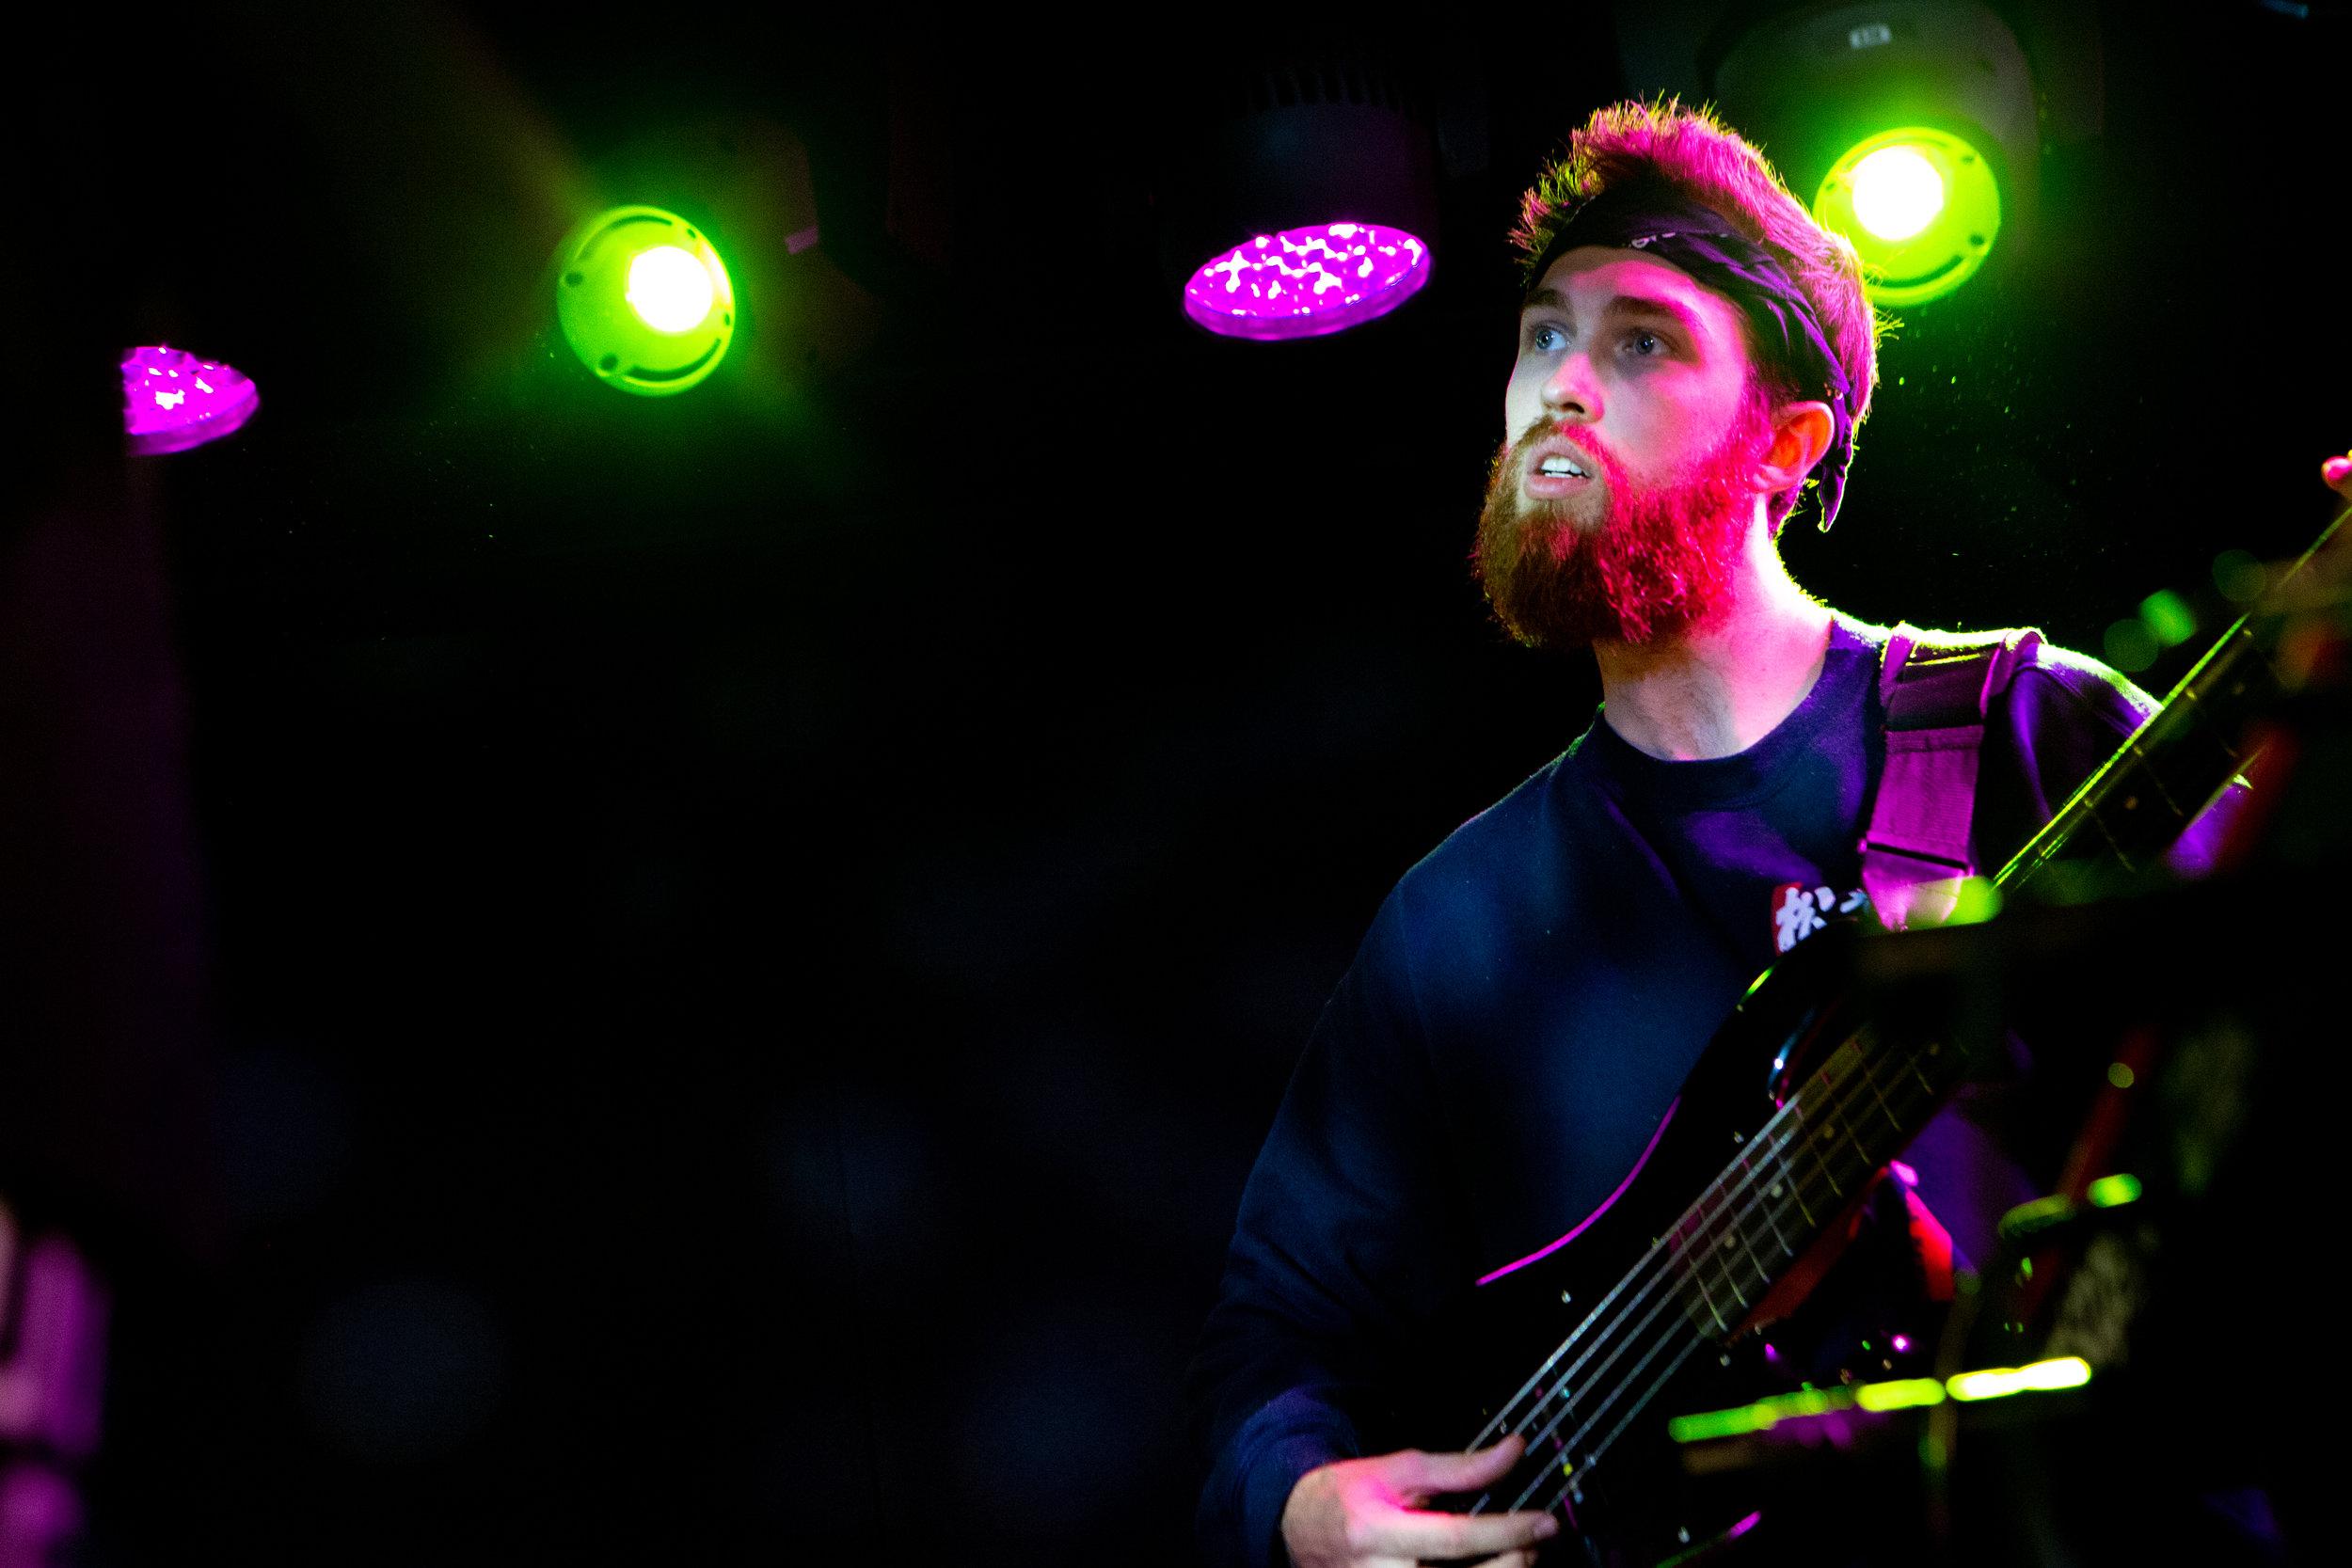 David Cutler on bass at Mercury Lounge. Photo courtesy of Sergio Carrasco.